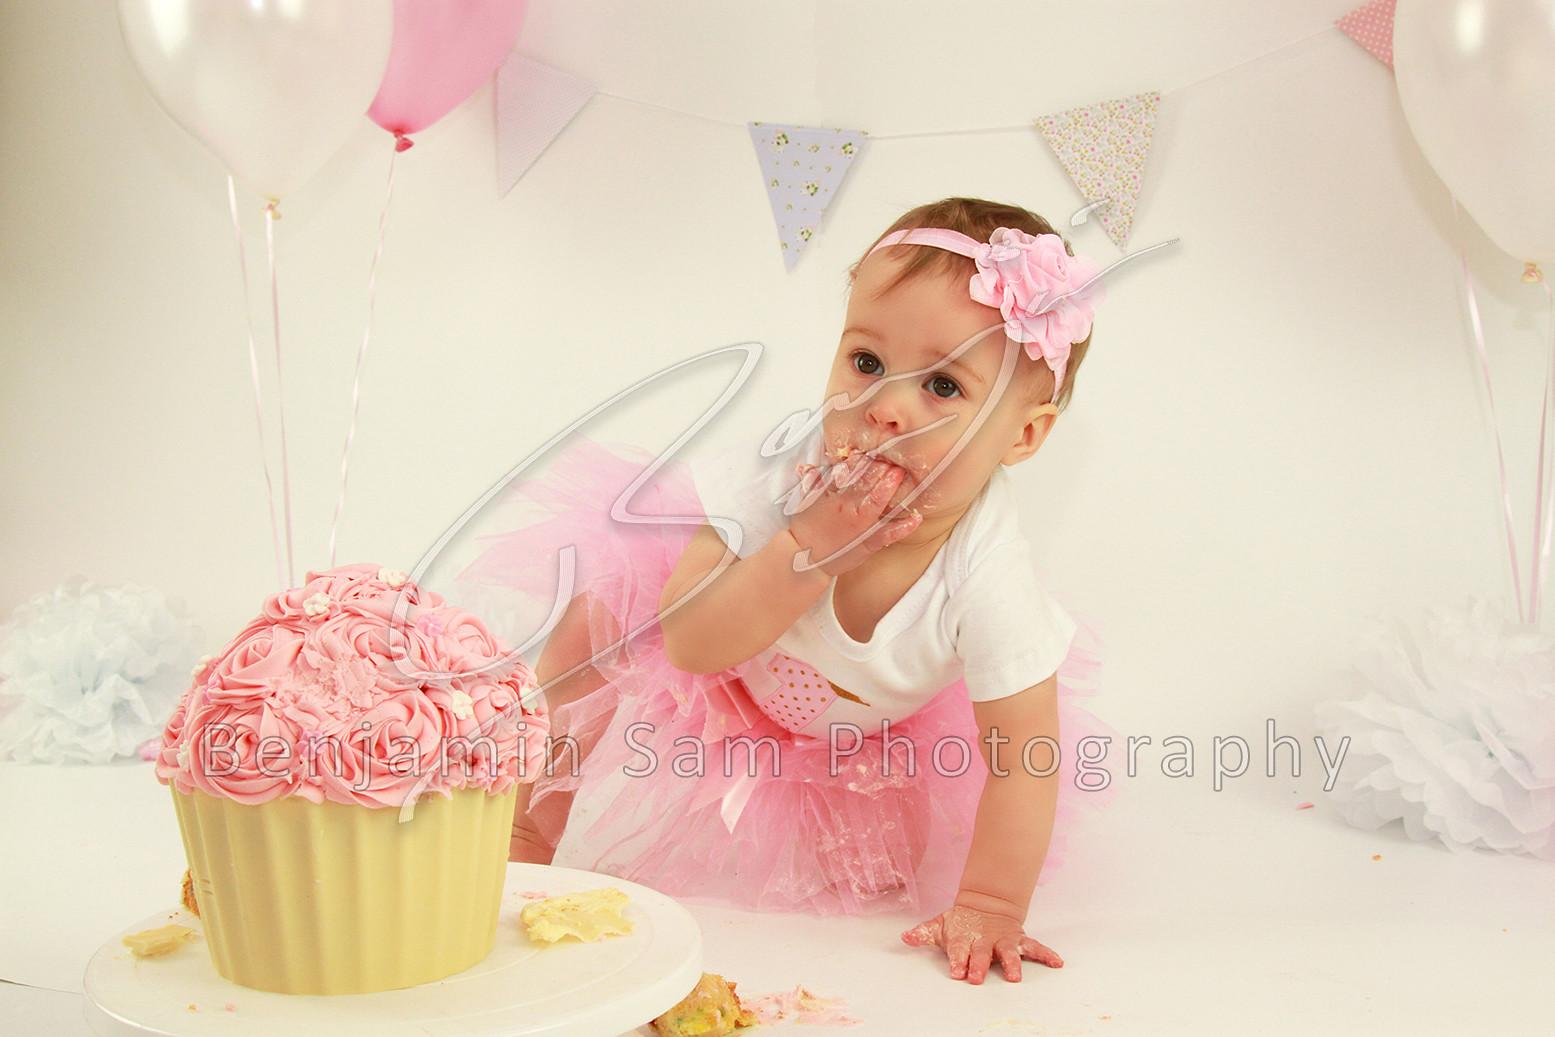 Cake - WM - 005